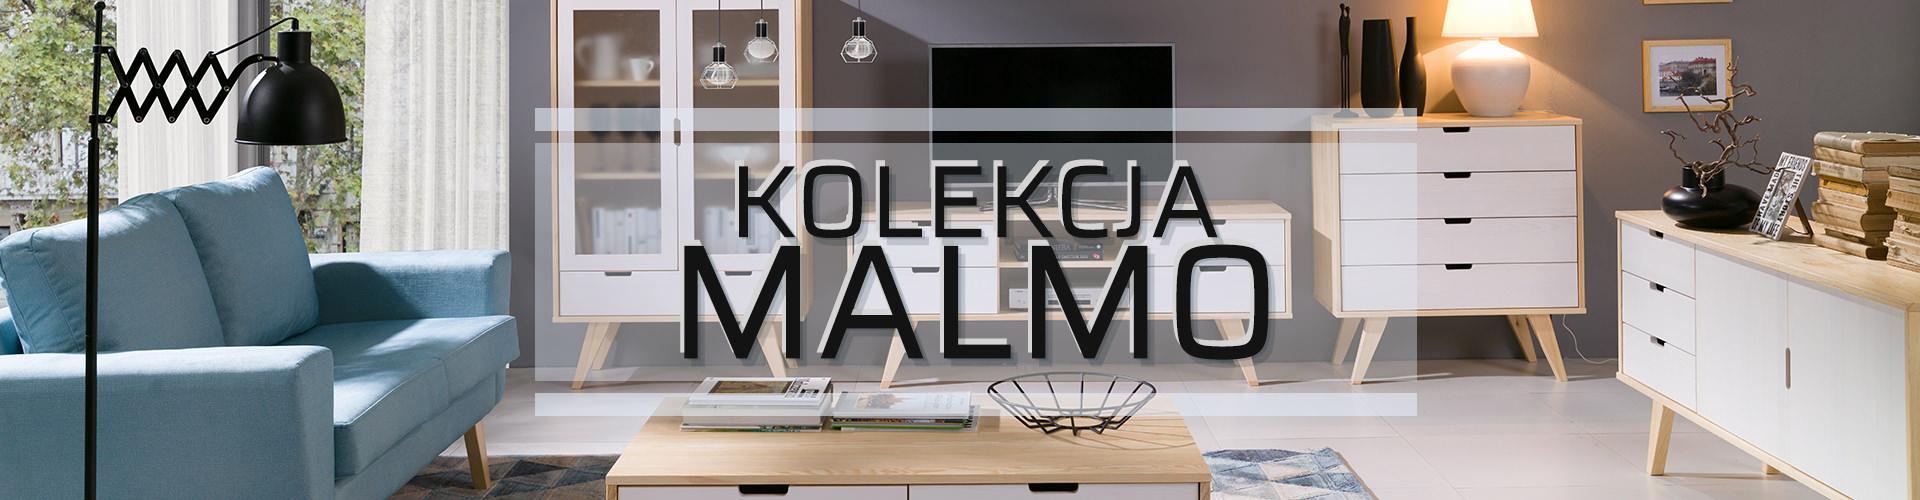 meble skandynawskie Malmo